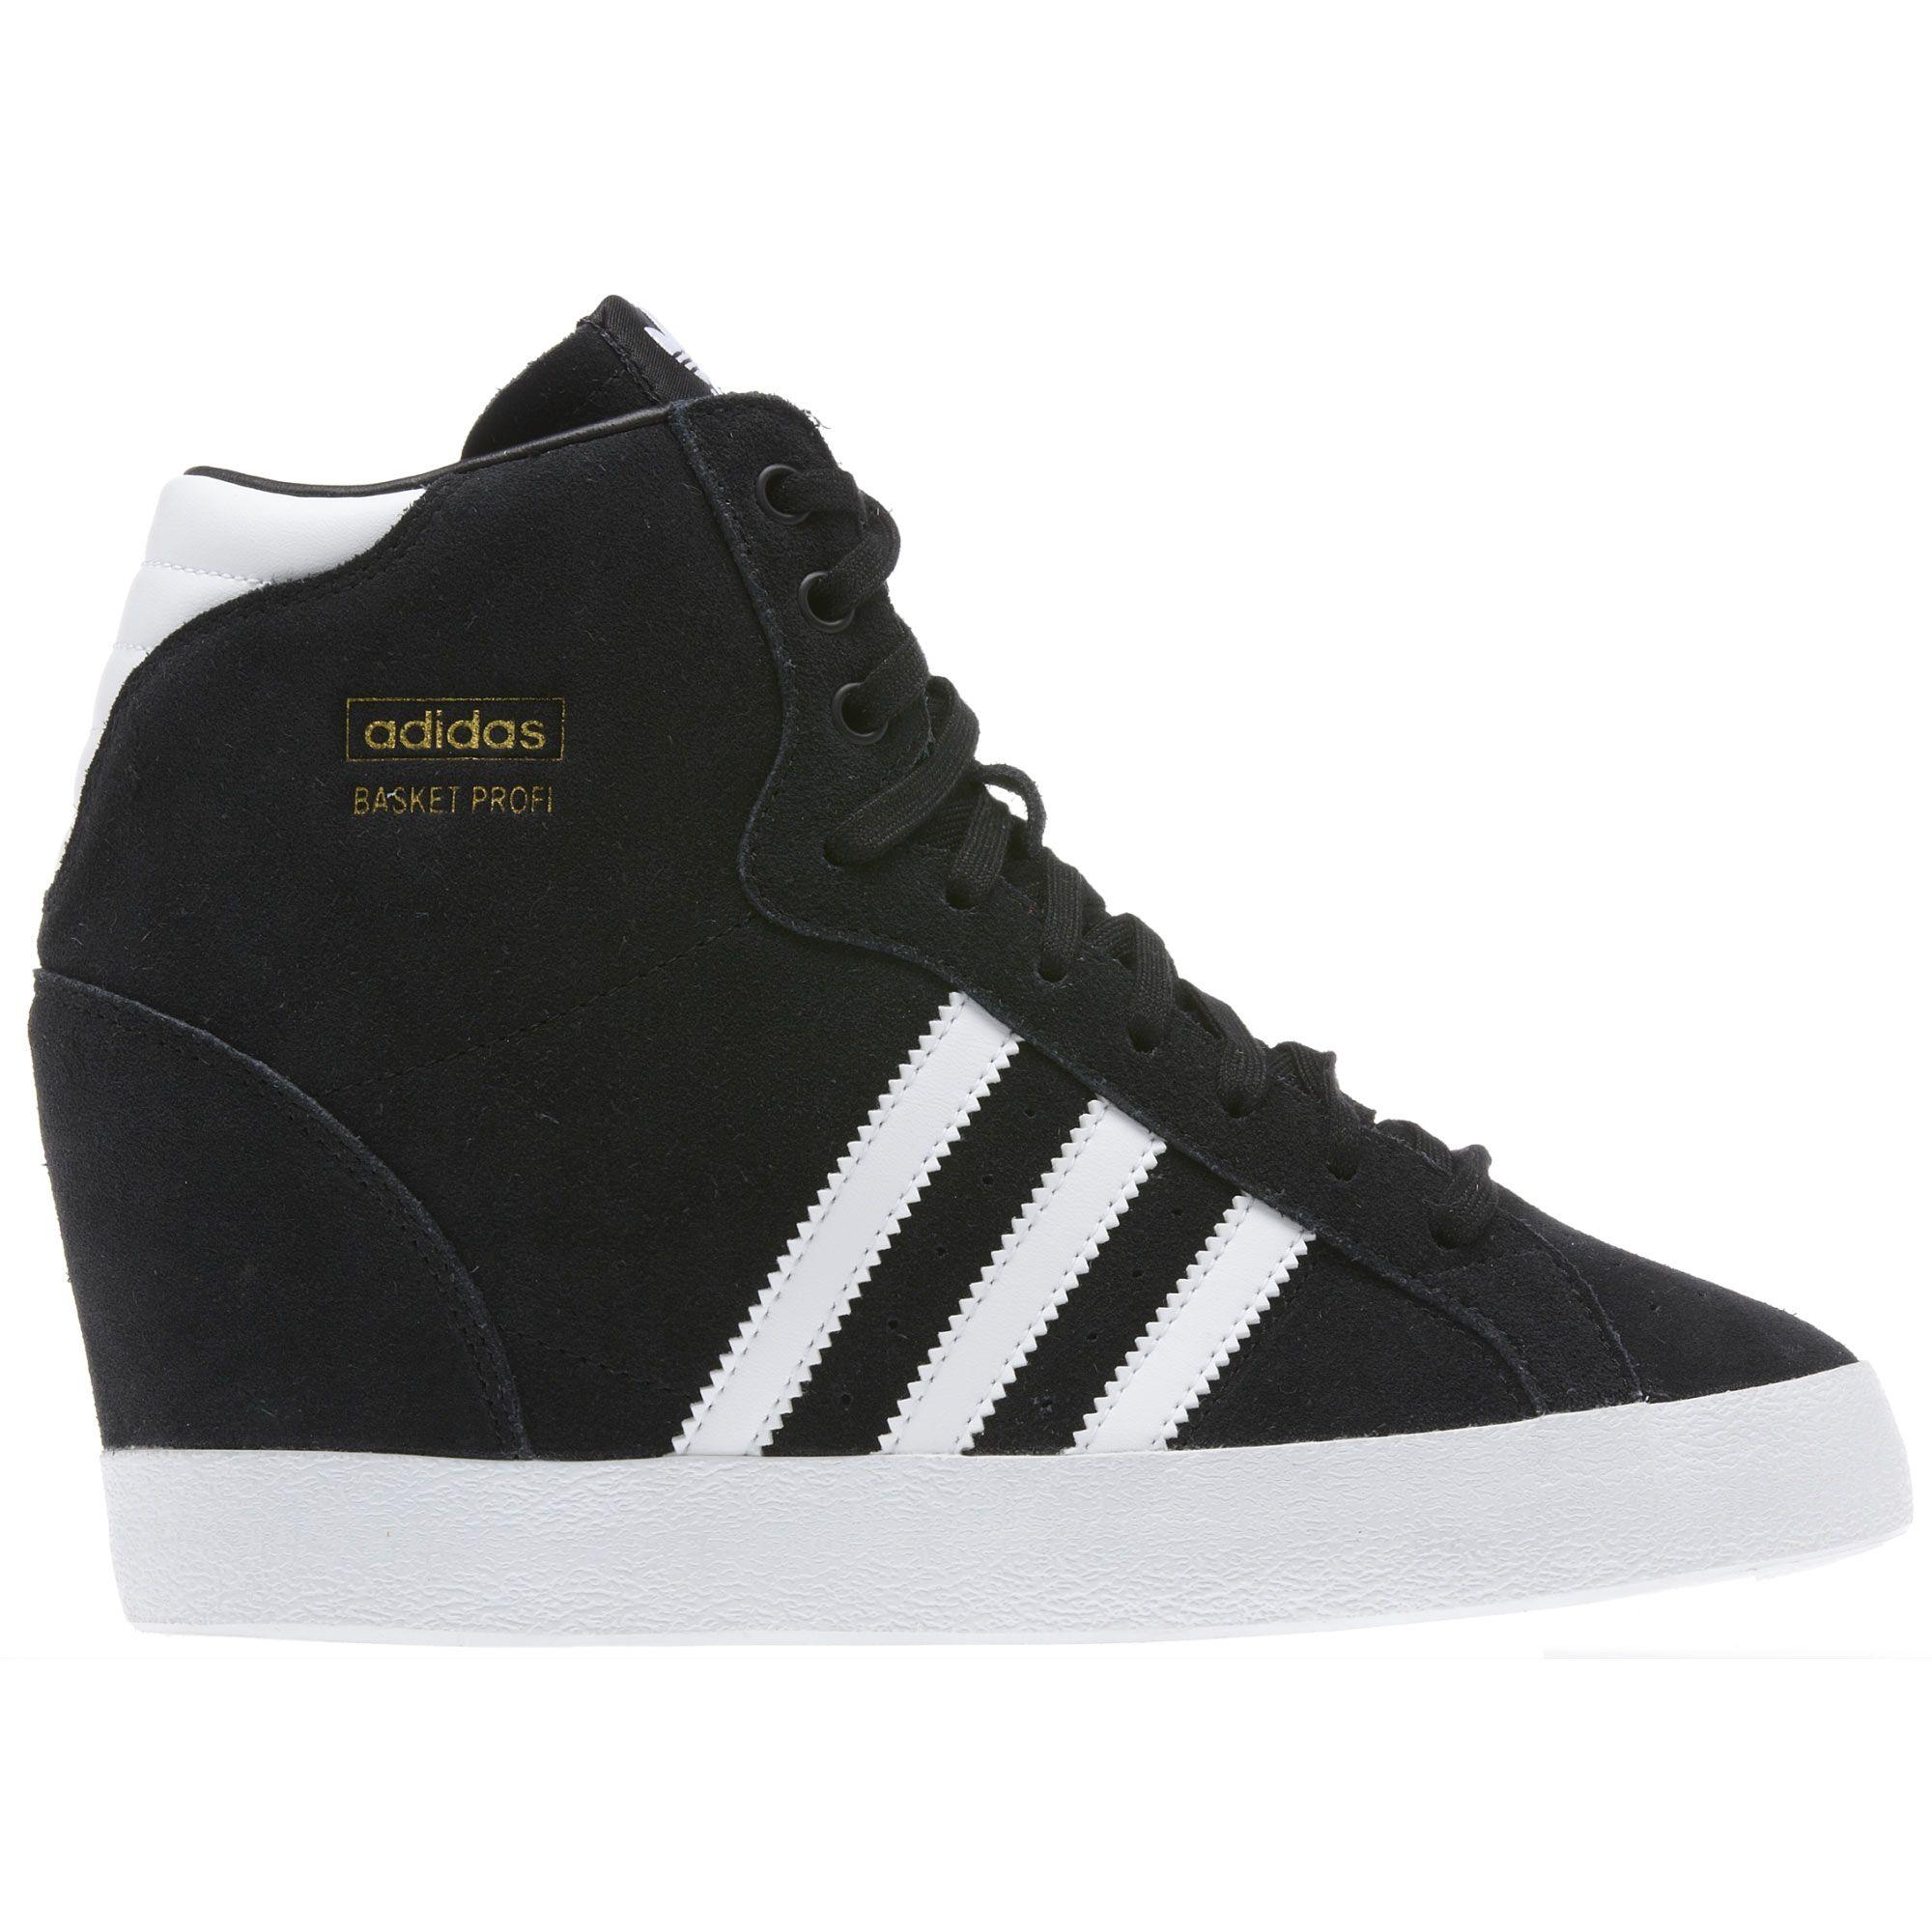 new style 383a0 6ab7a adidas Women s Basket Profi Up Shoes   adidas Ireland